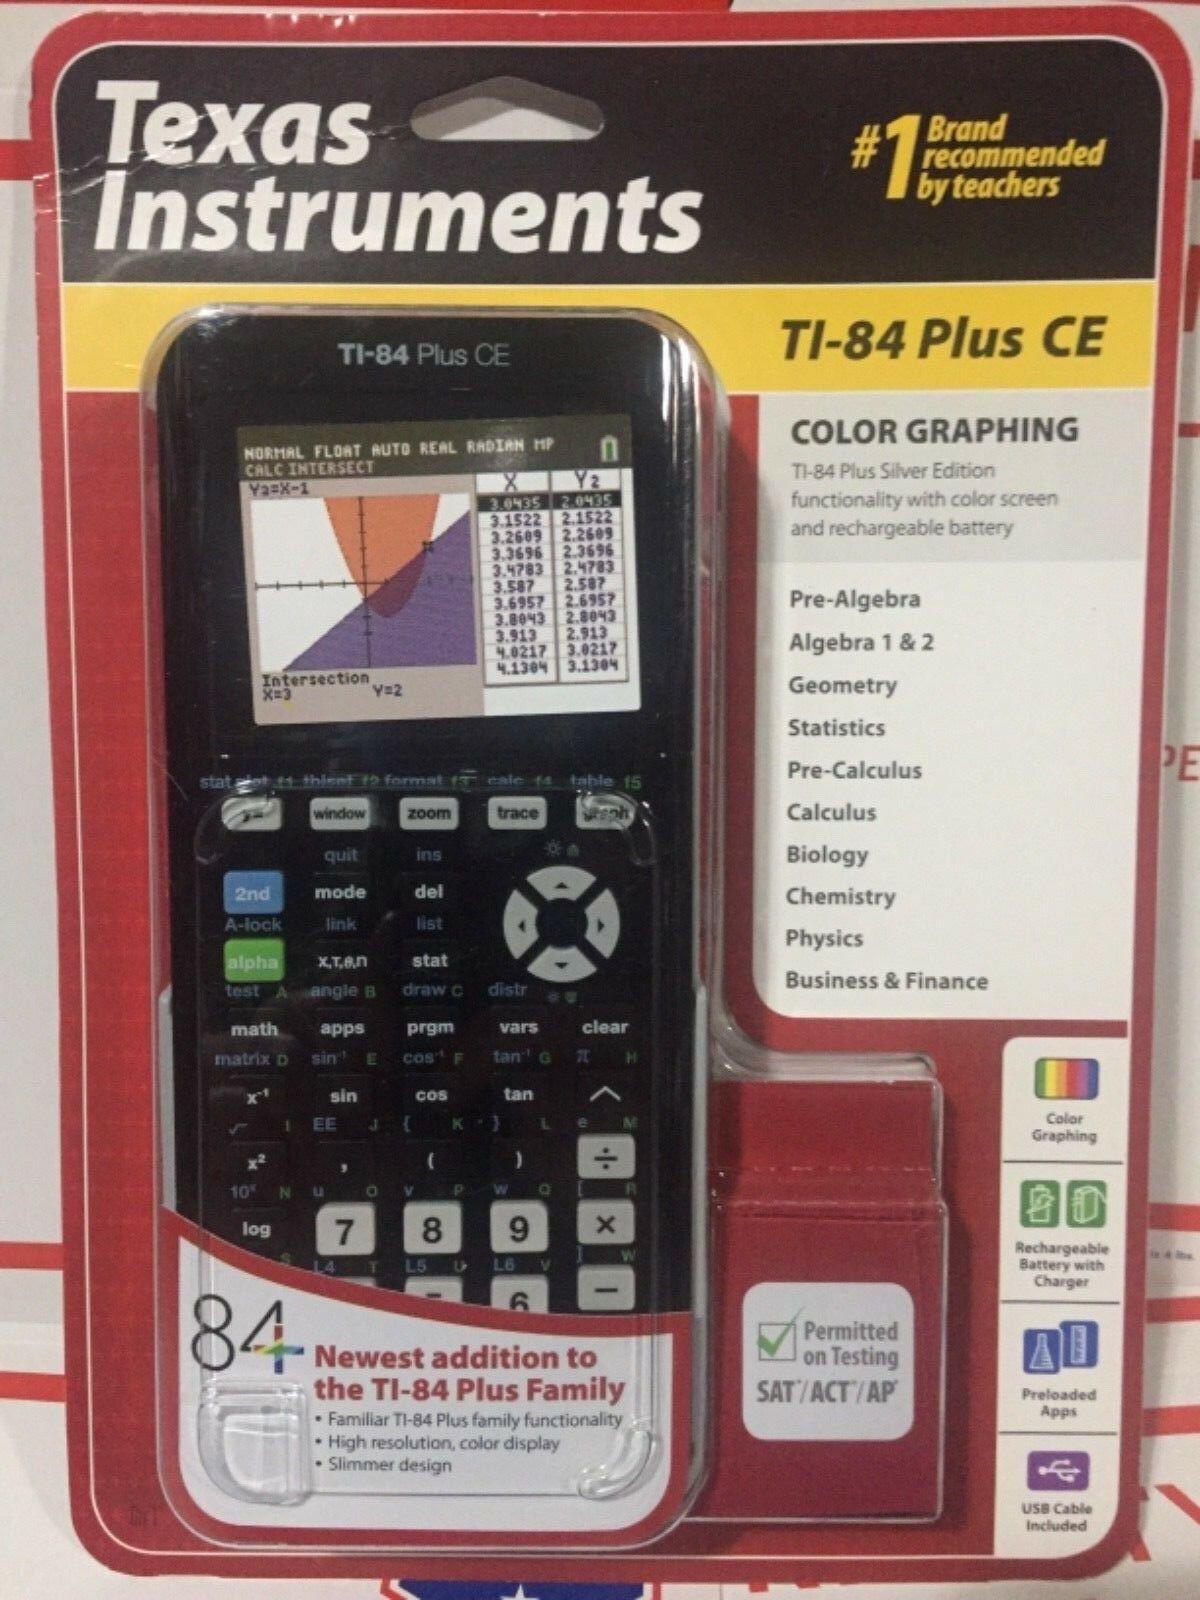 New TI-84 Plus CE Graphing Calculator